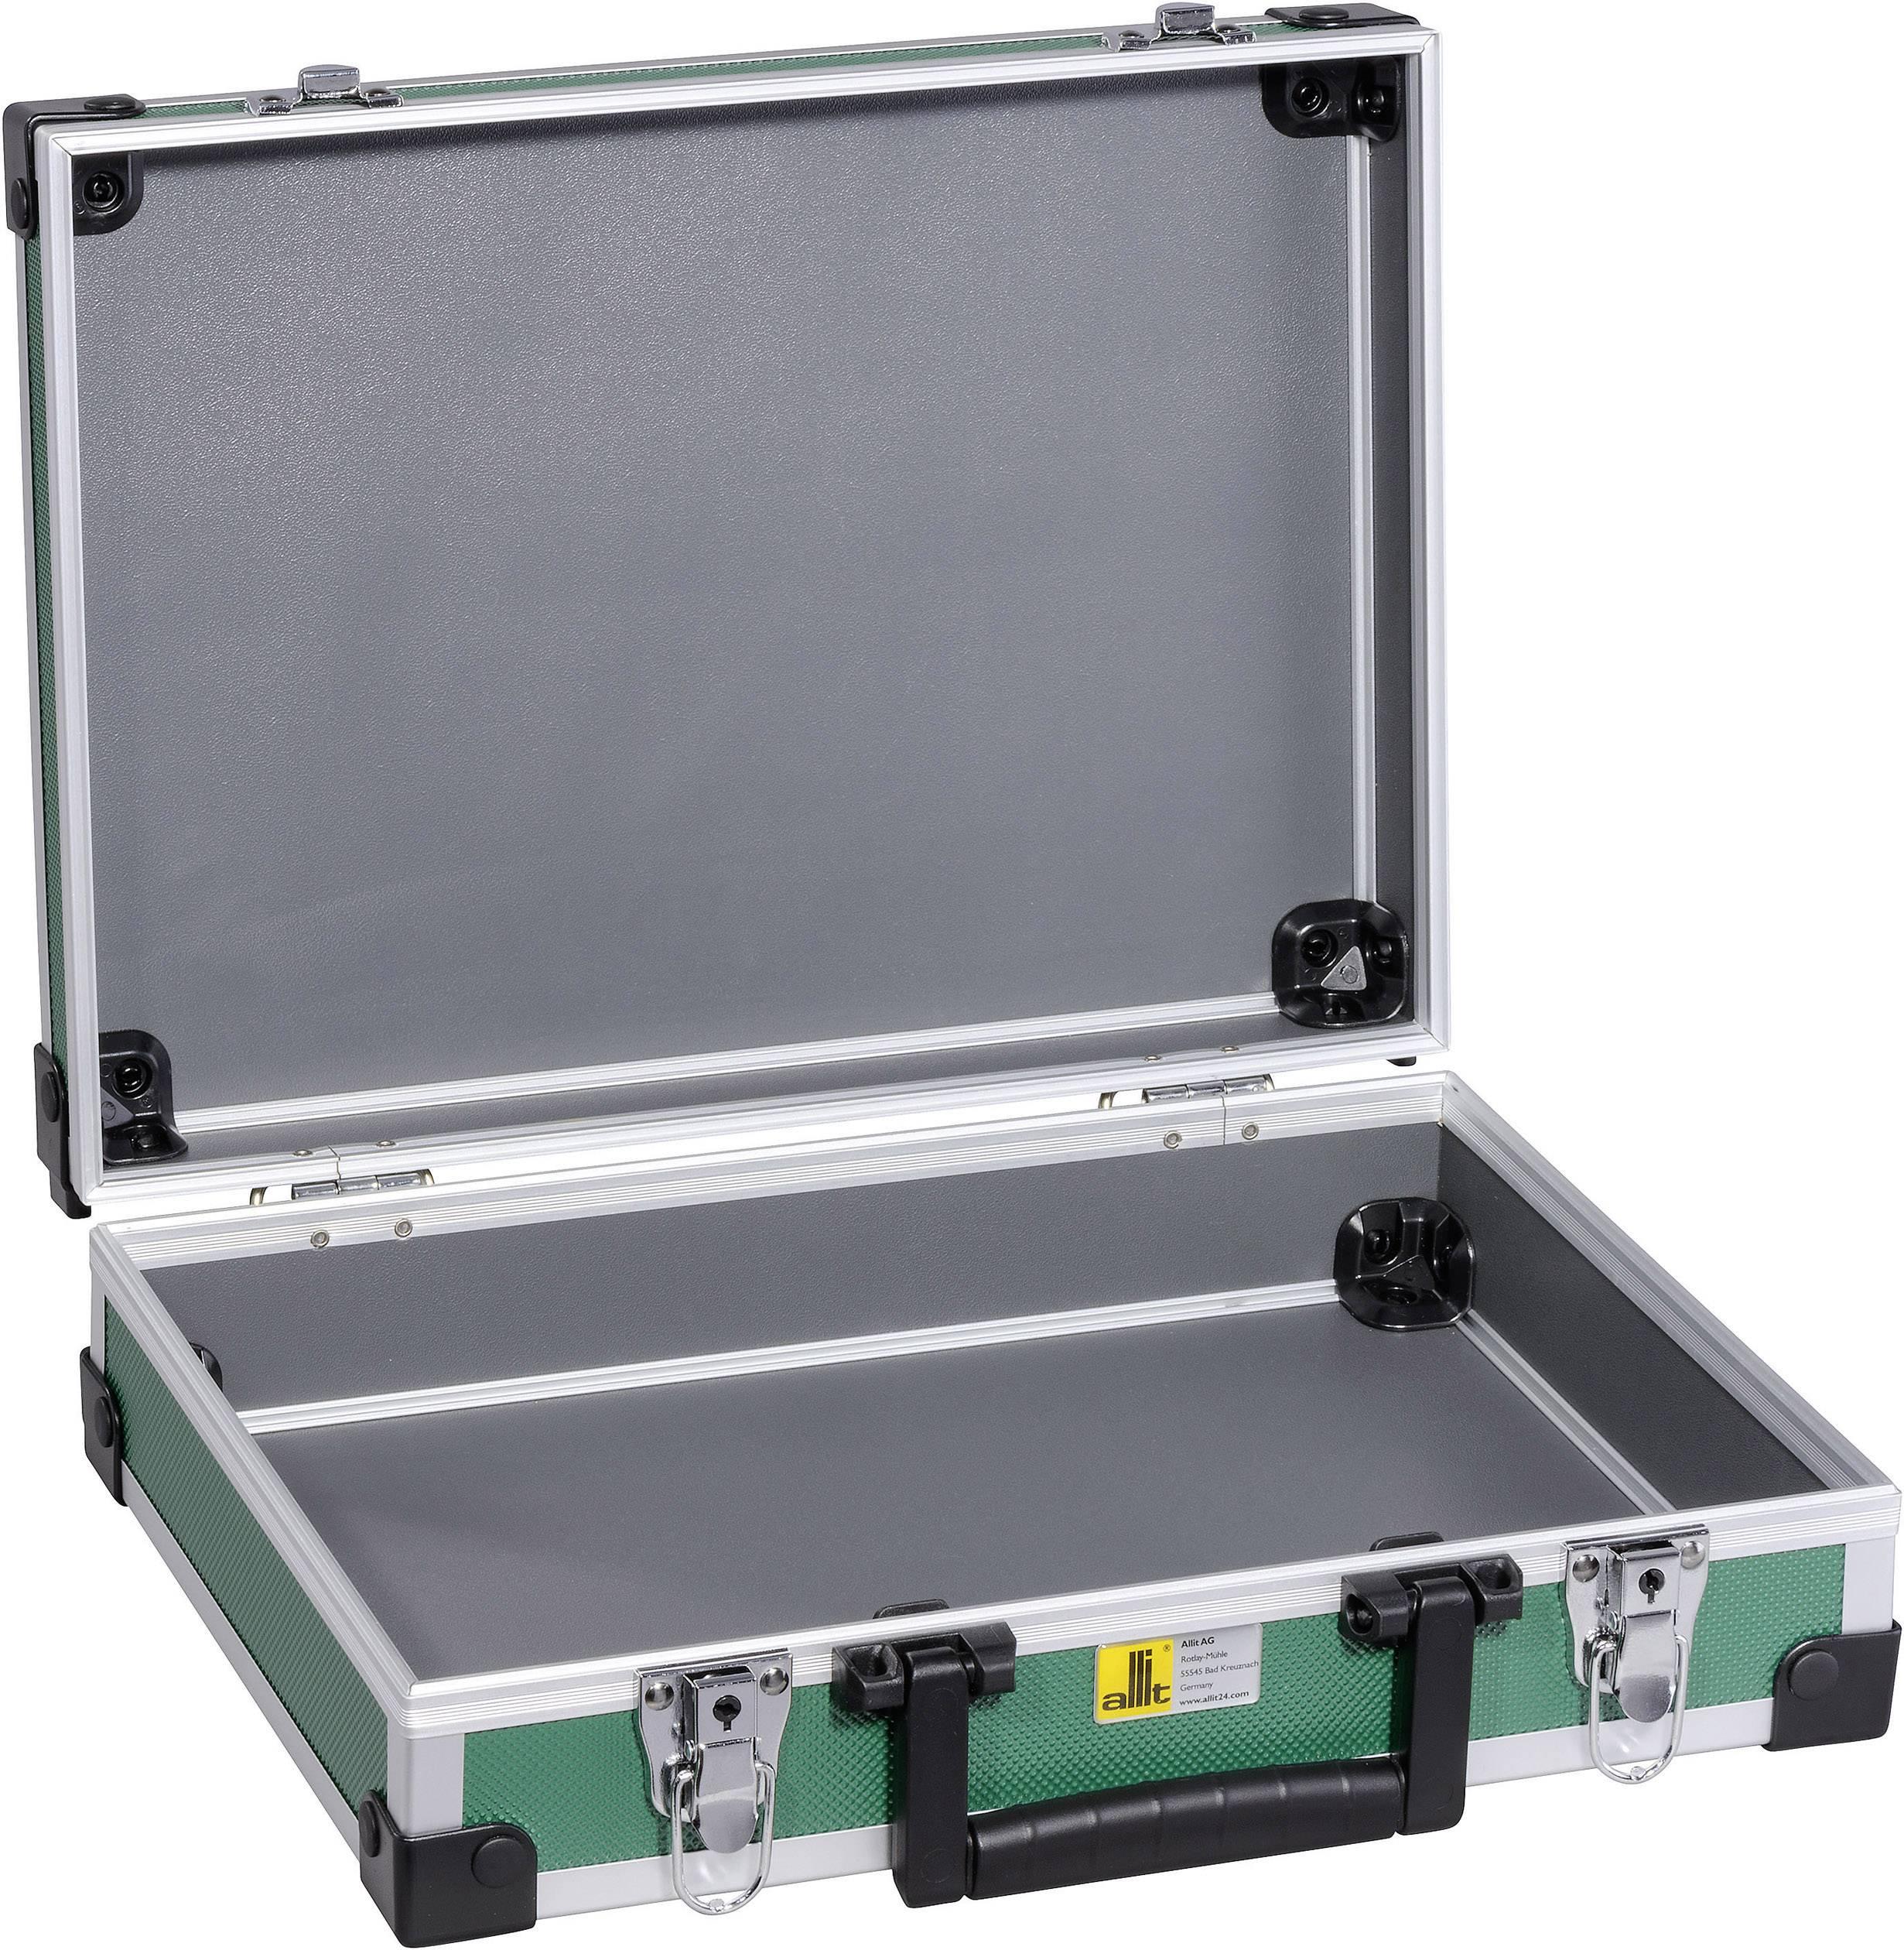 Kufrík na náradie Allit AluPlus Basic L 35 424130, (d x š x v) 345 x 285 x 105 mm